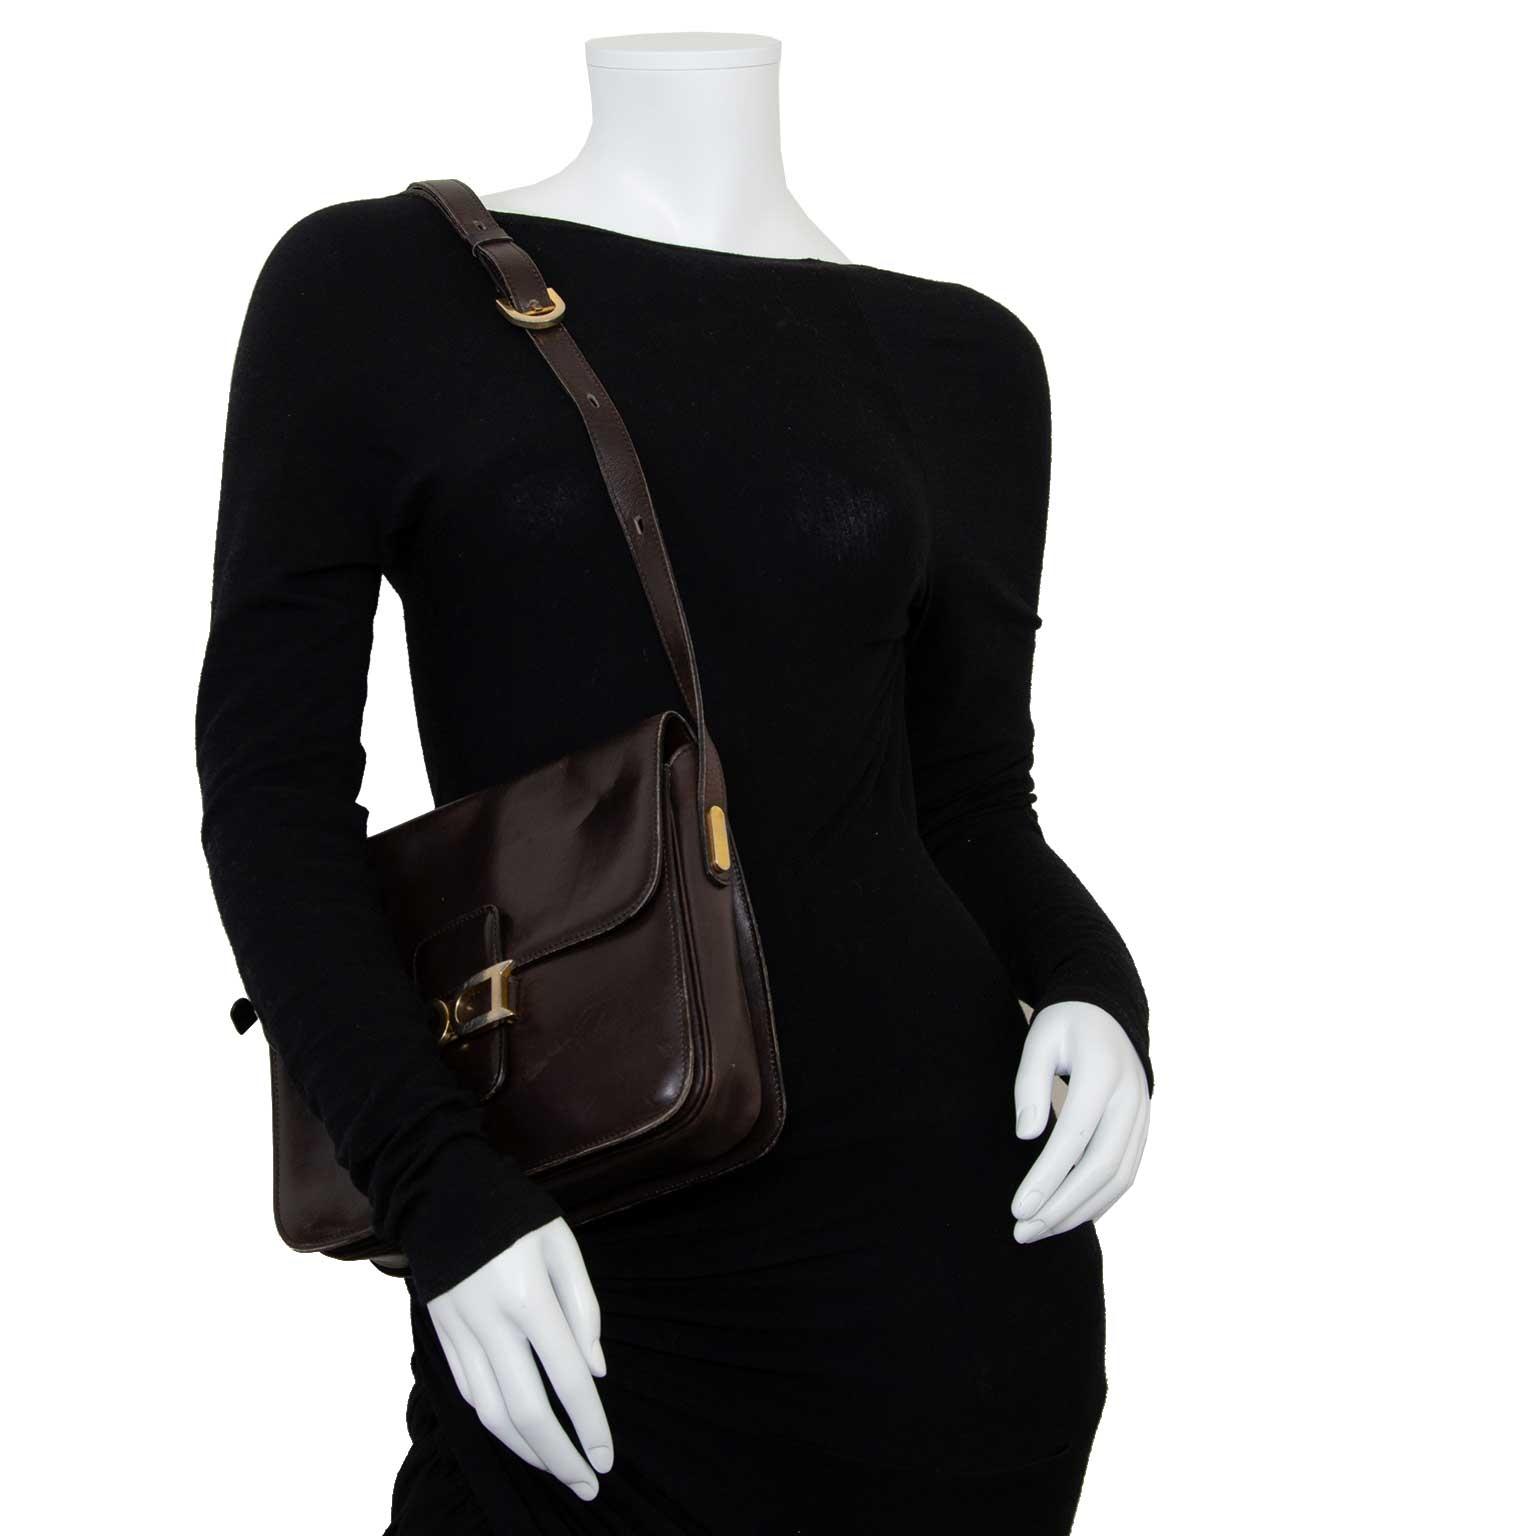 delvaux brown leather bourgogne bag now for sale at labellov vintage fashion webshop belgium